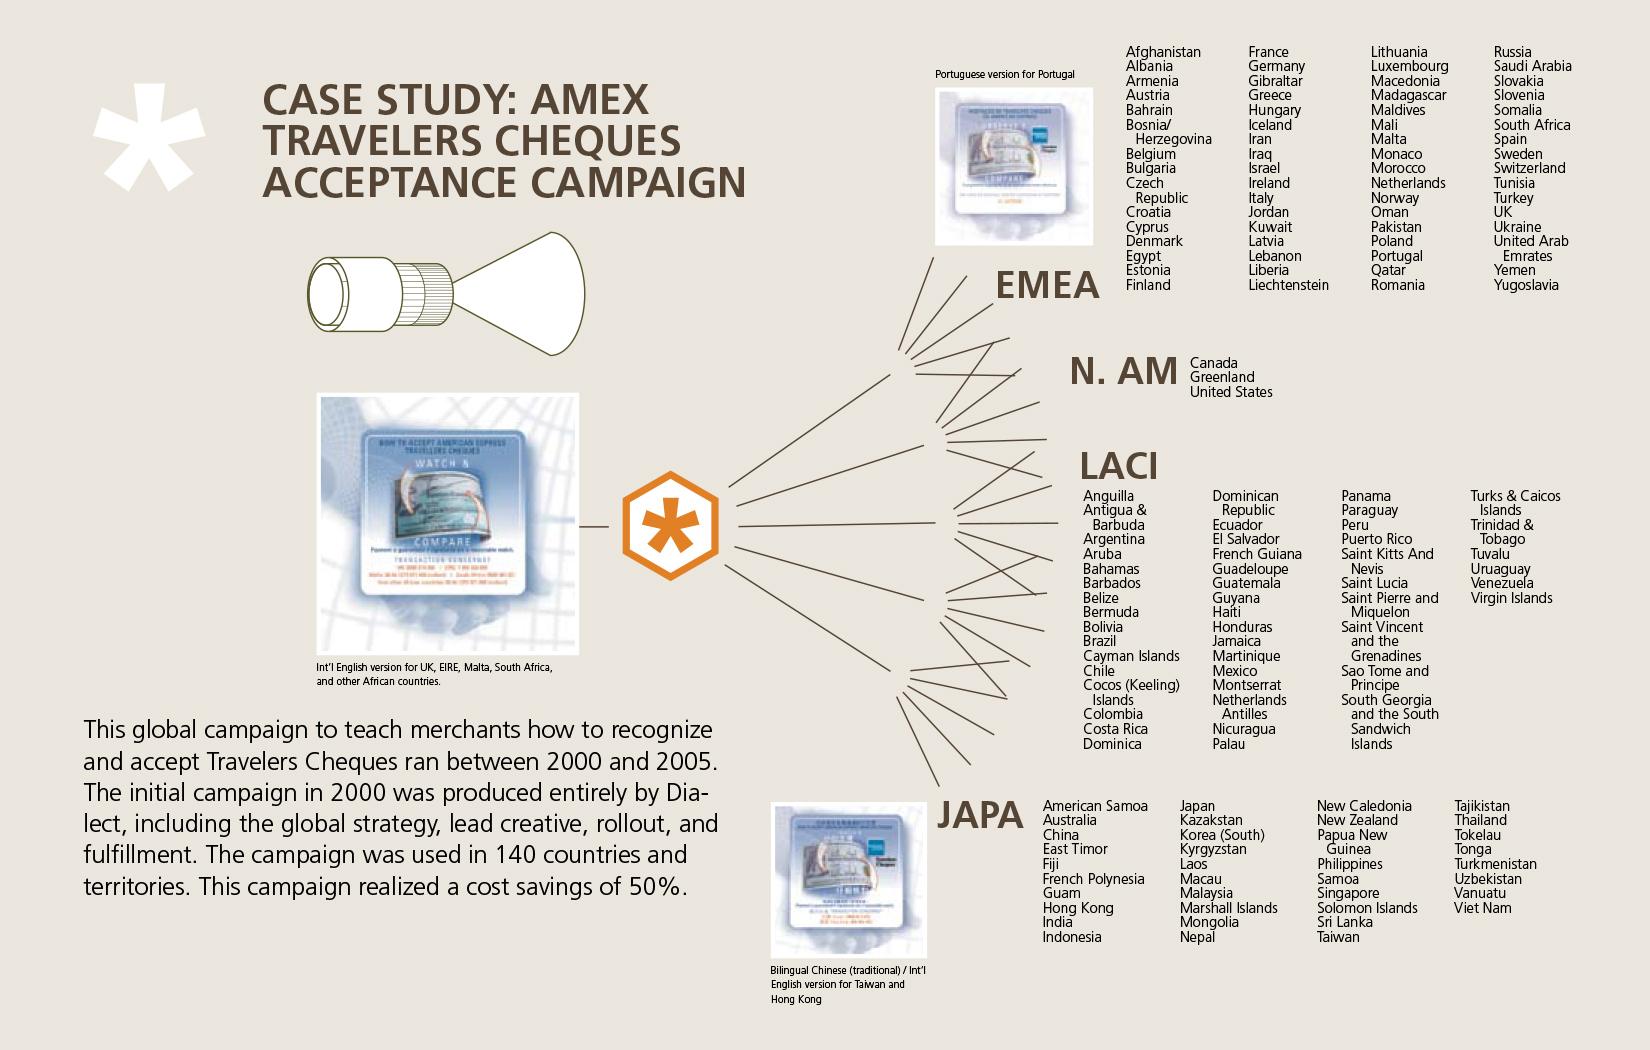 AMX FSI Case Study 1.jpg